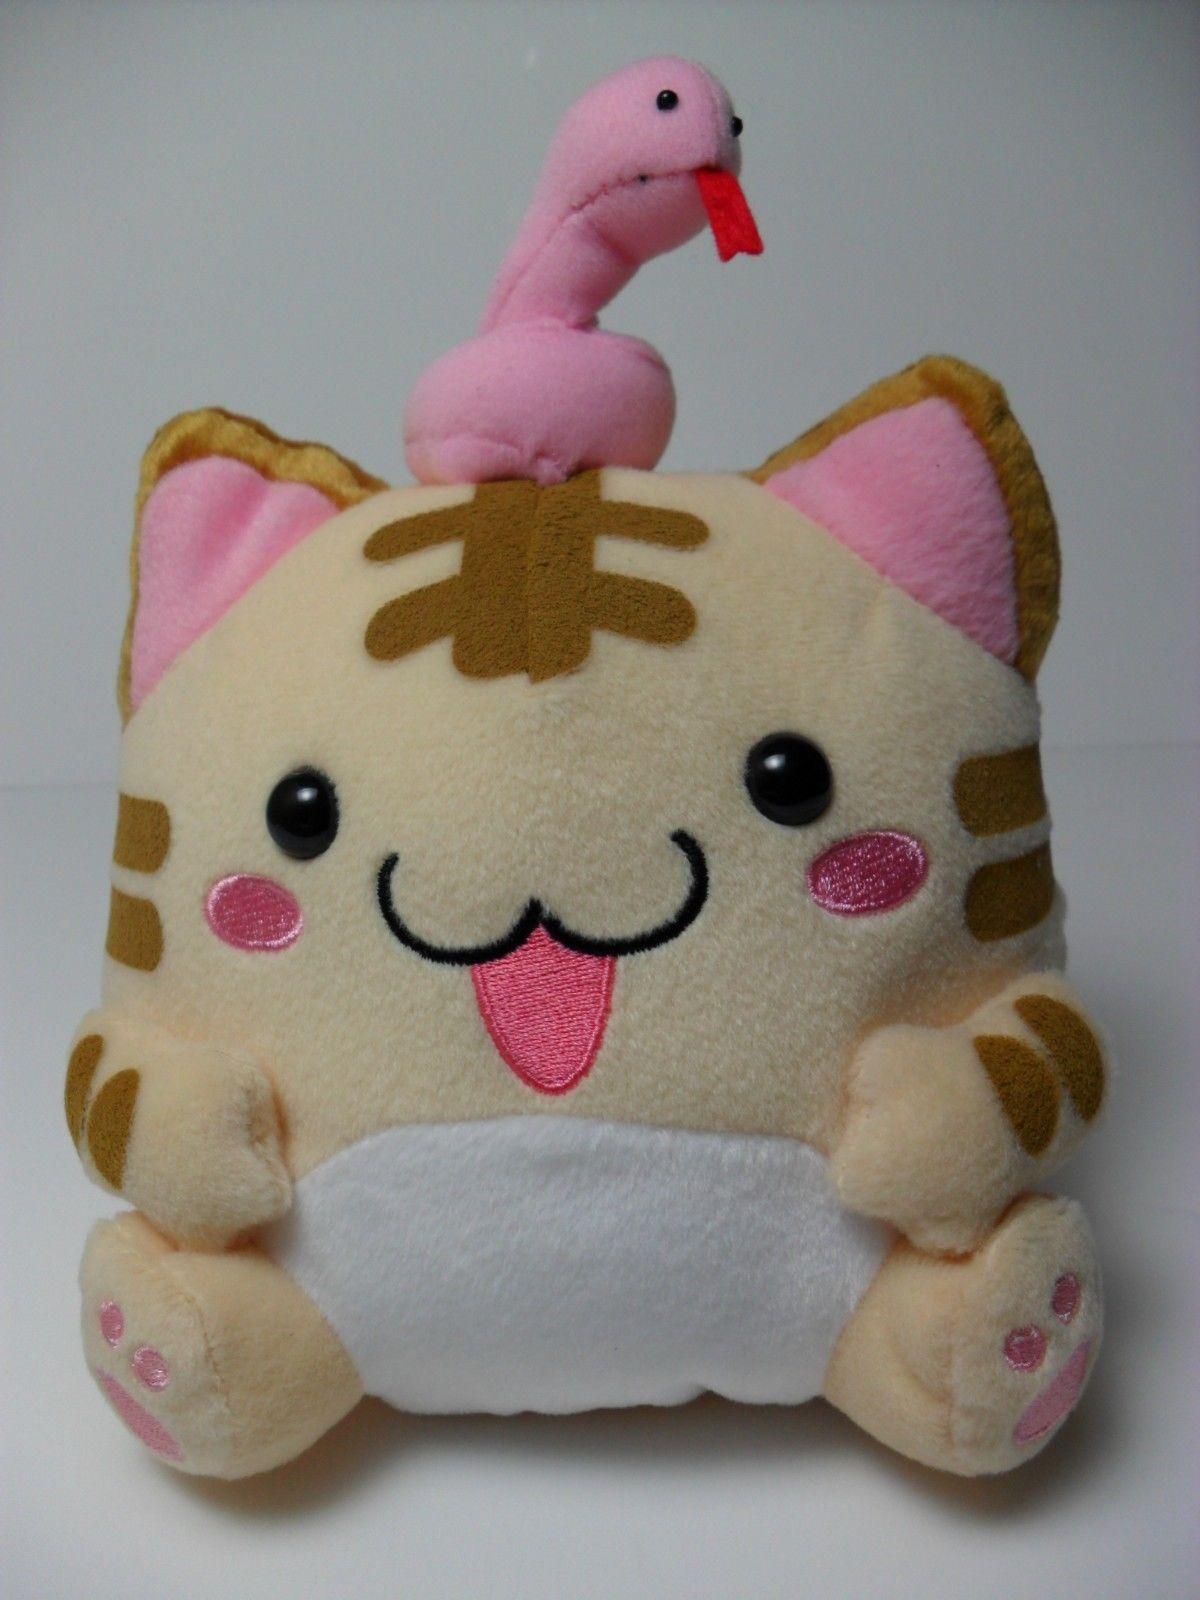 Maruneko Snake Charmer Tiger Stripe Yellow Cat 16cm Plush Kawaii